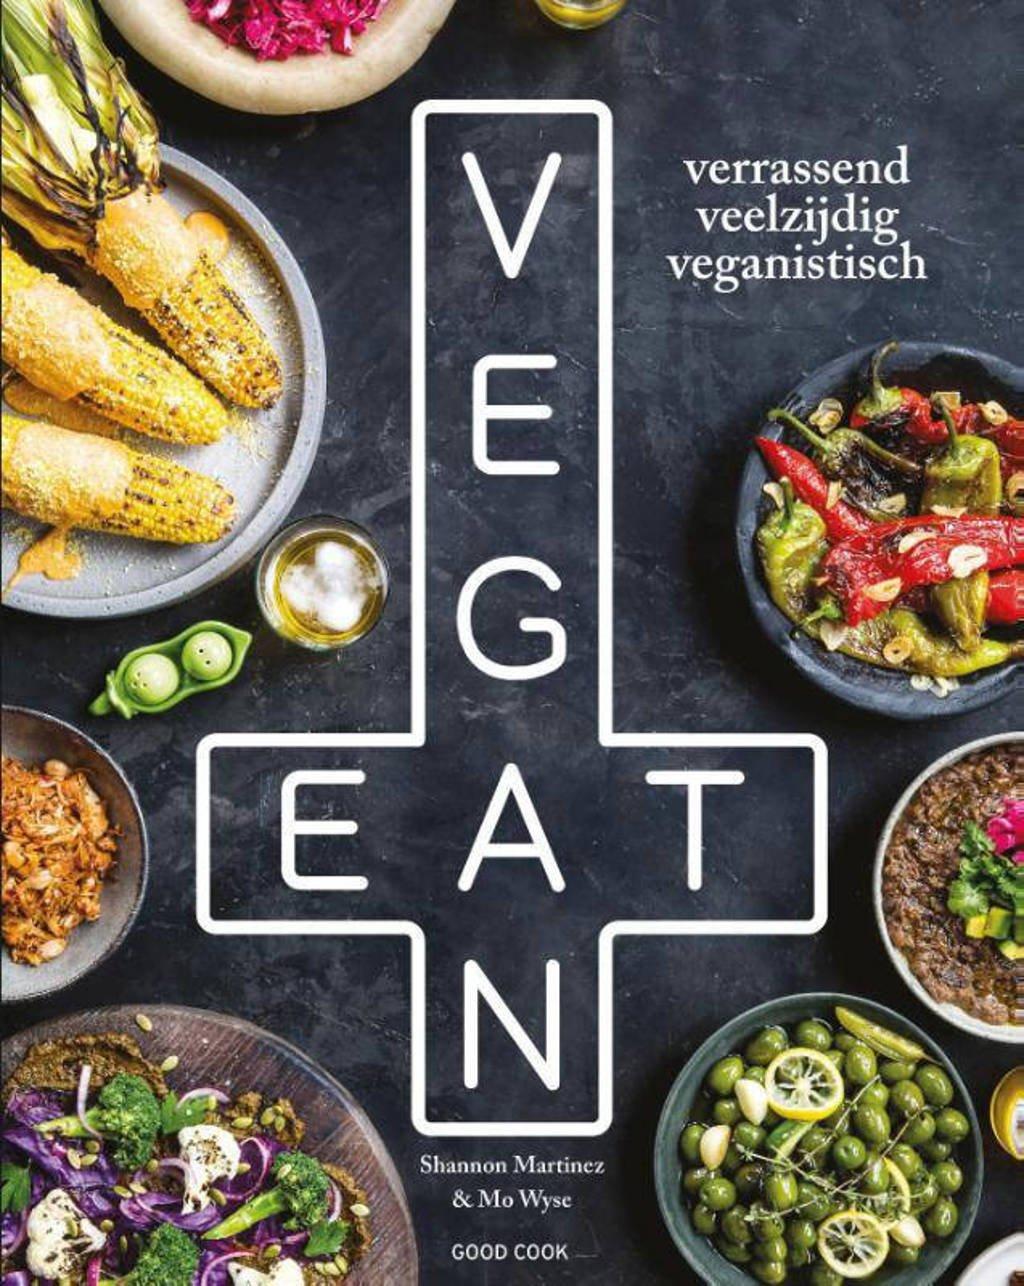 Eat vegan - Shannon Martinez en Mo Wyse